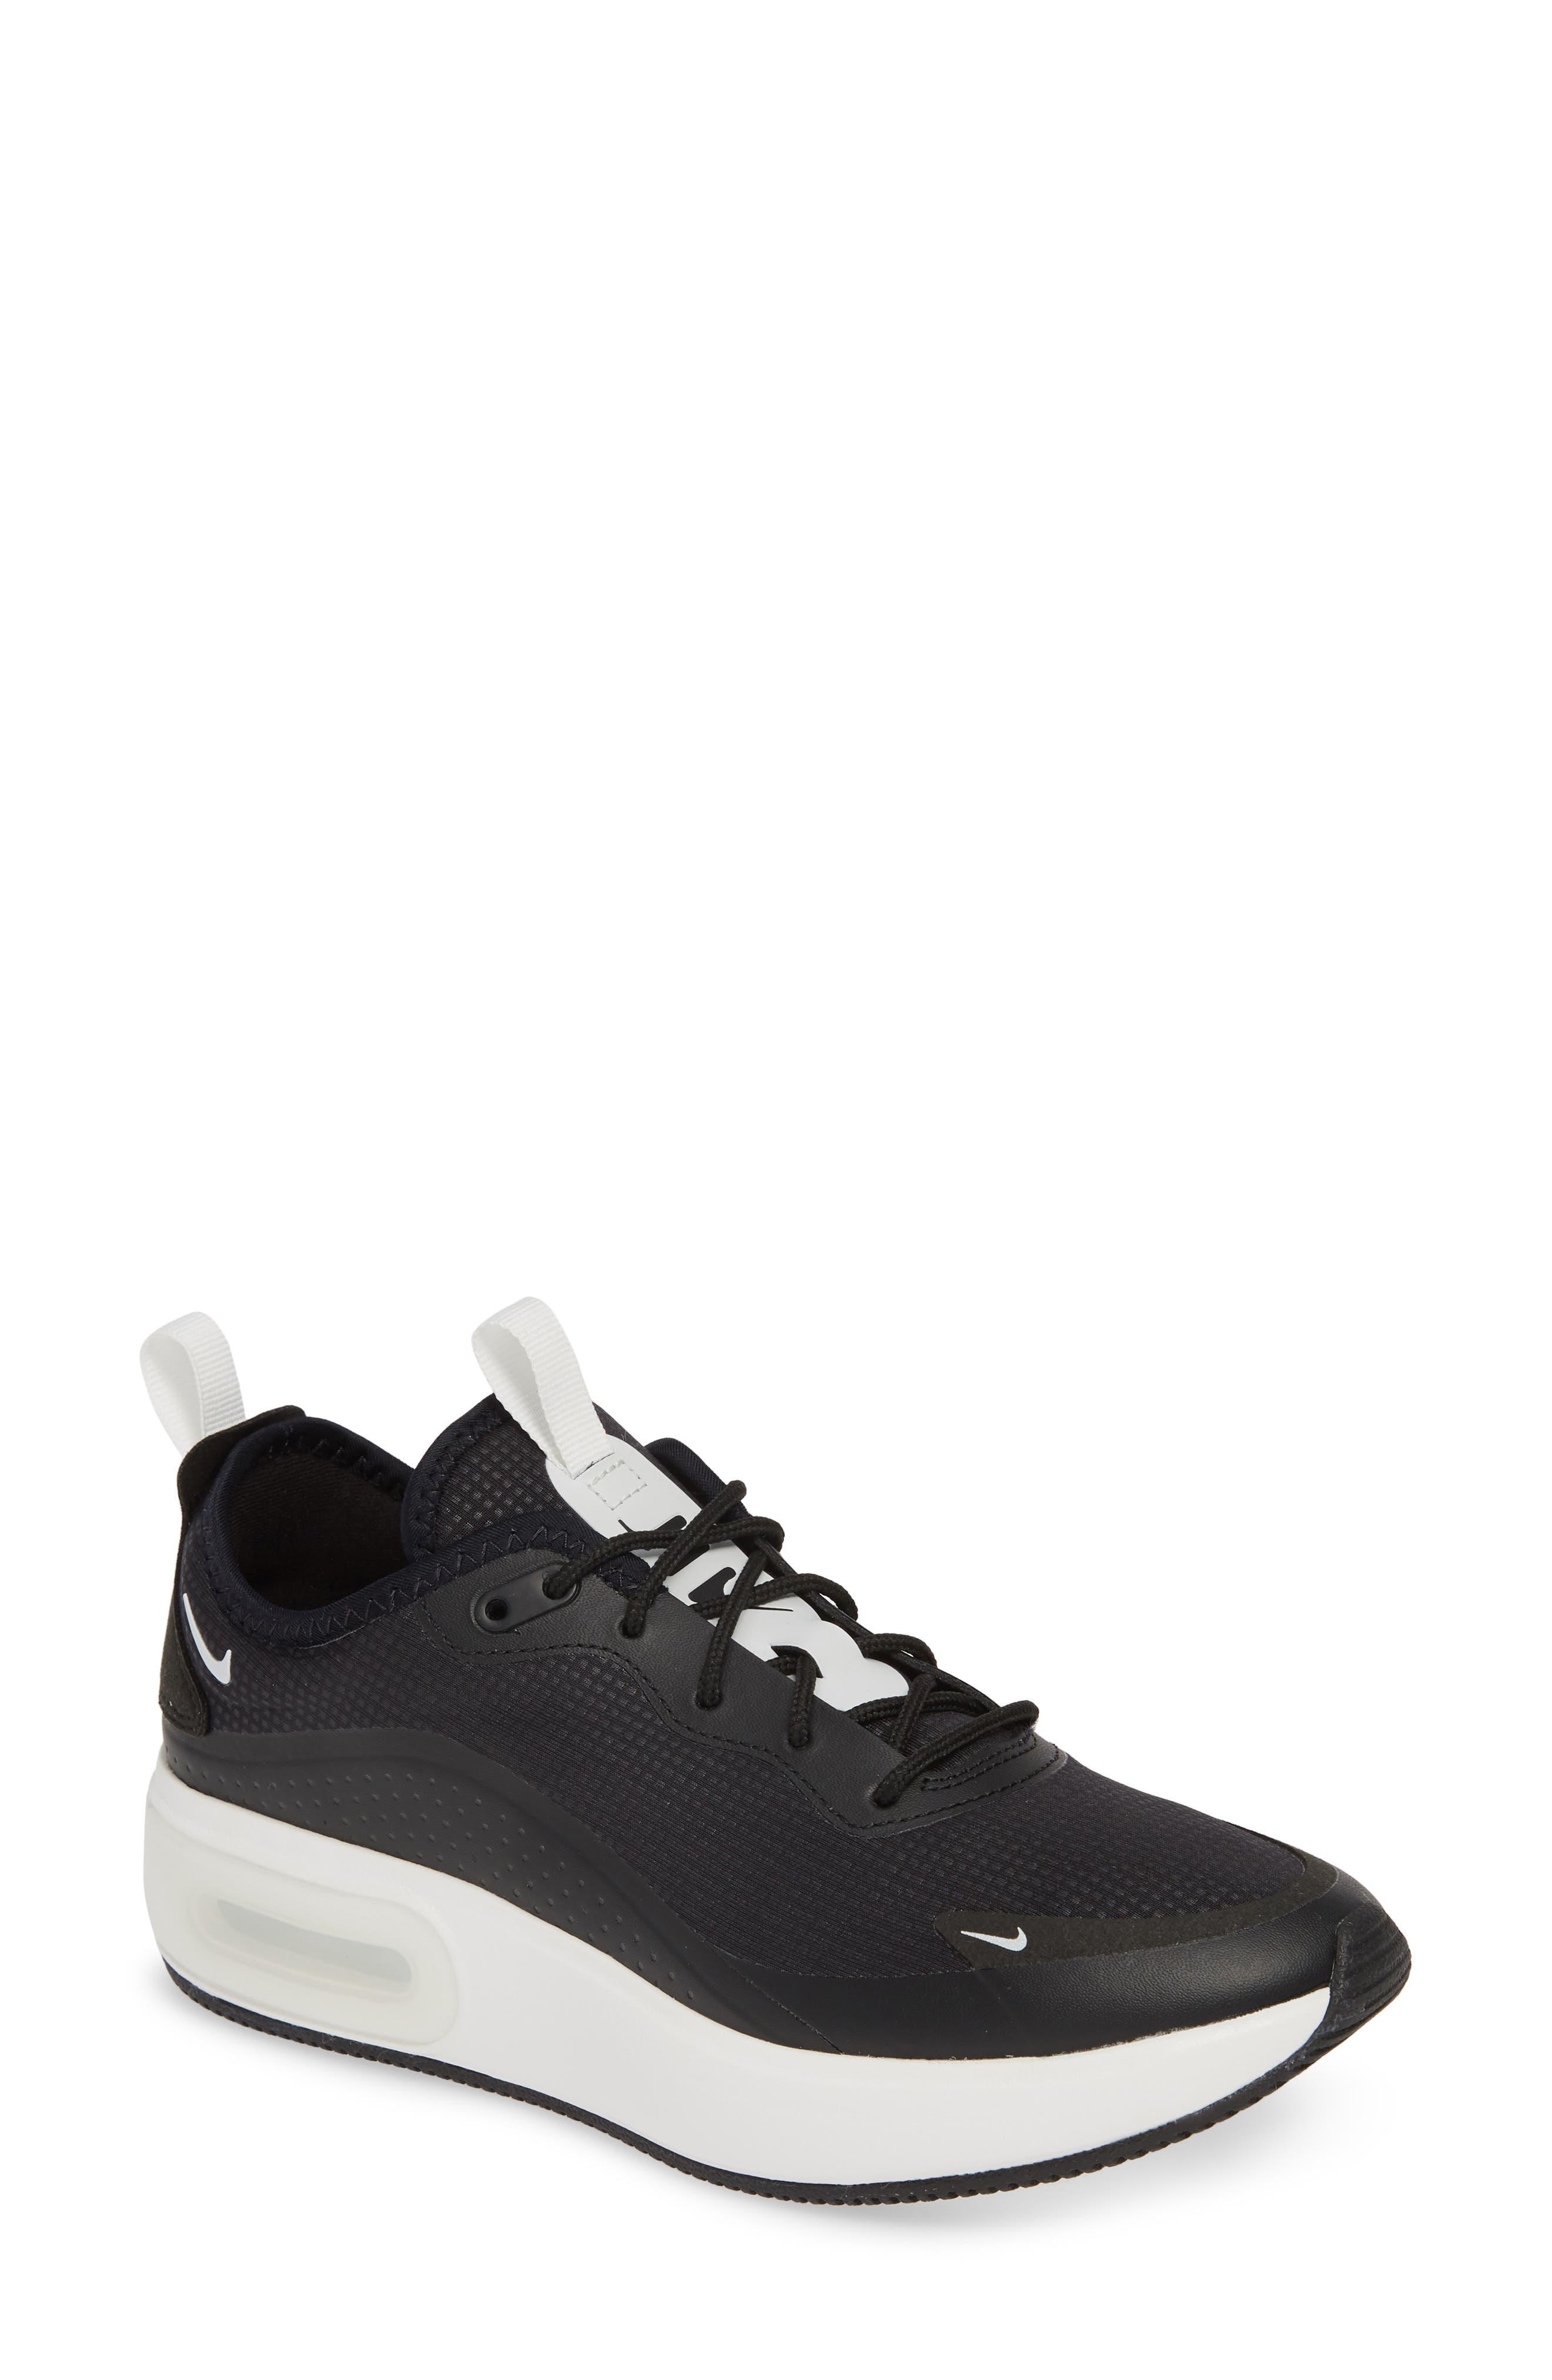 NIKE Air Max Dia Sneaker, Main, color, BLACK/ SUMMIT WHITE